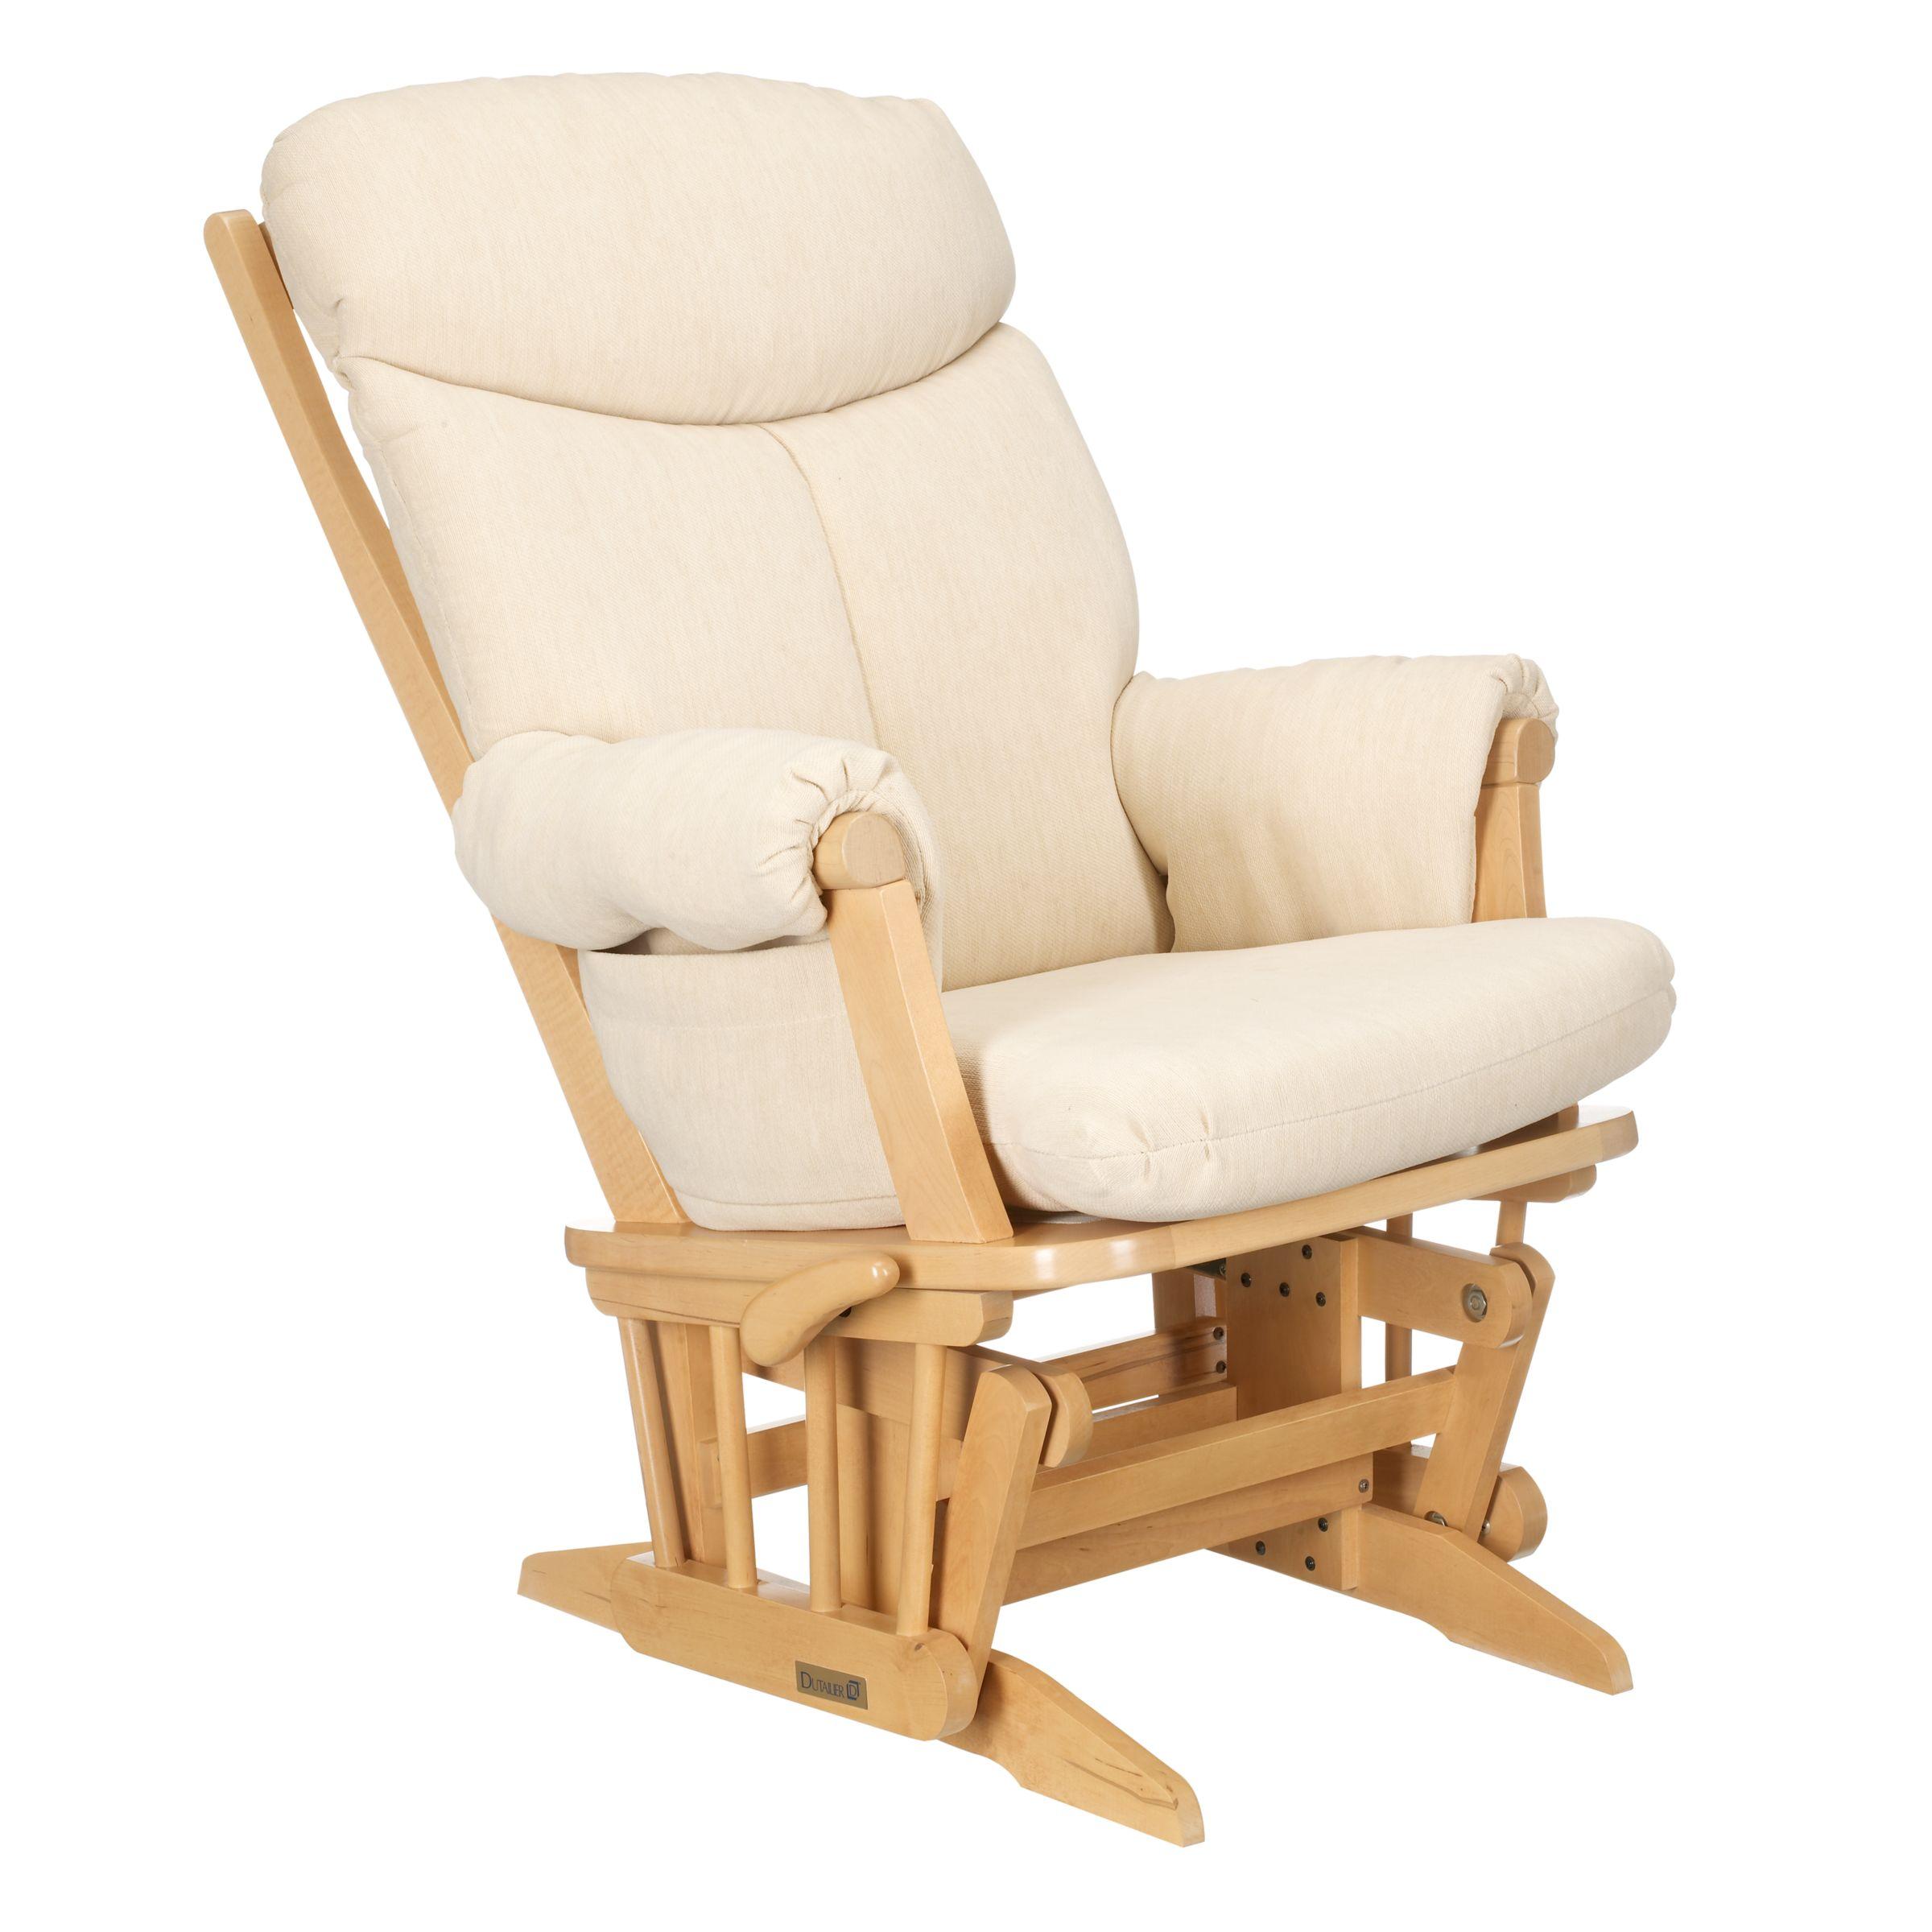 Polly Glider Chair, Soft Beige/Natural at JohnLewis